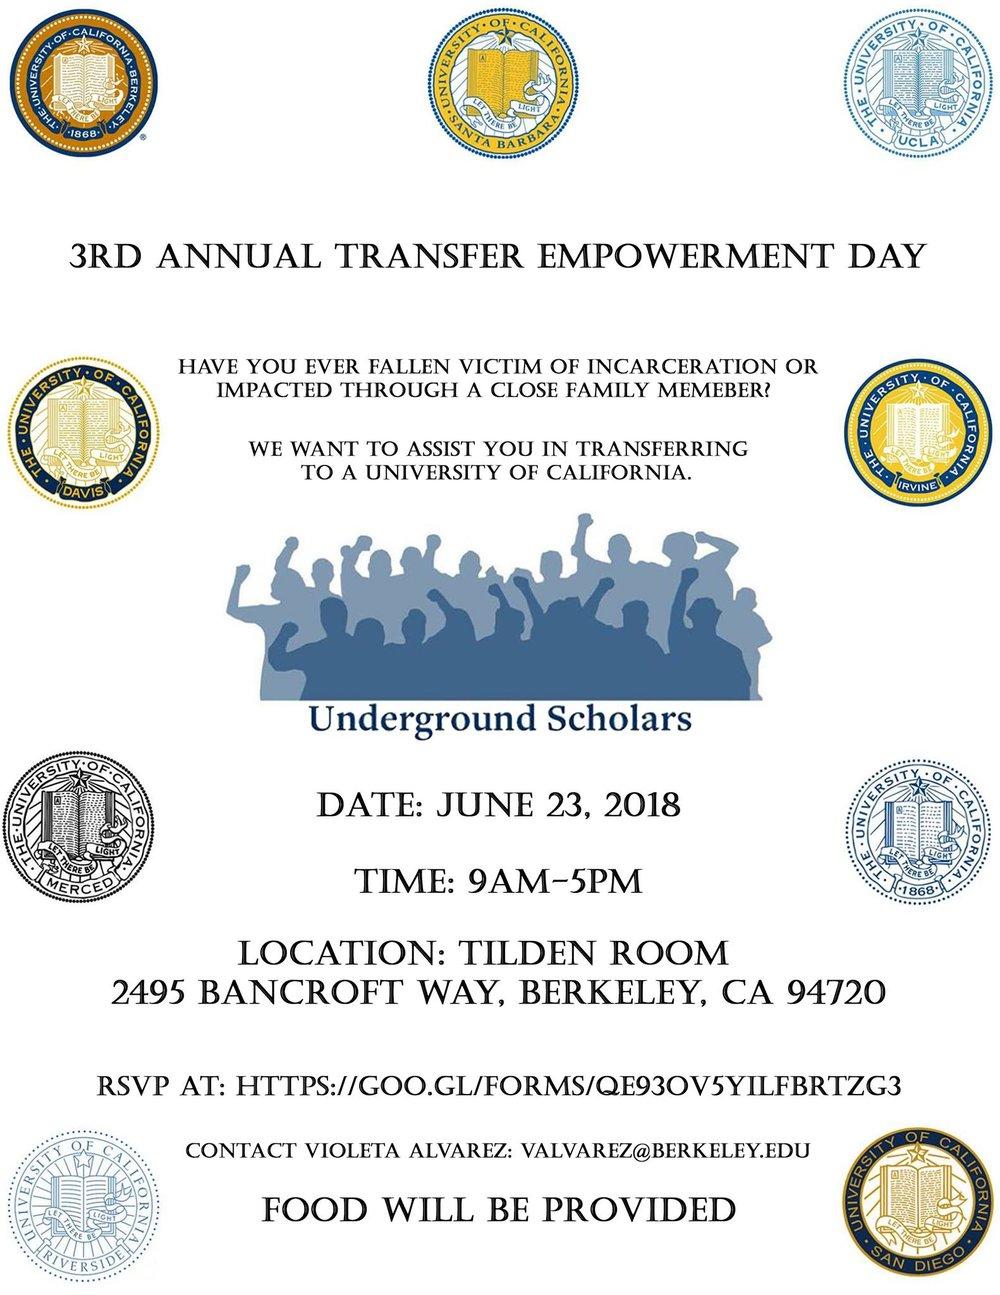 transfer_empowerment_2018.jpg